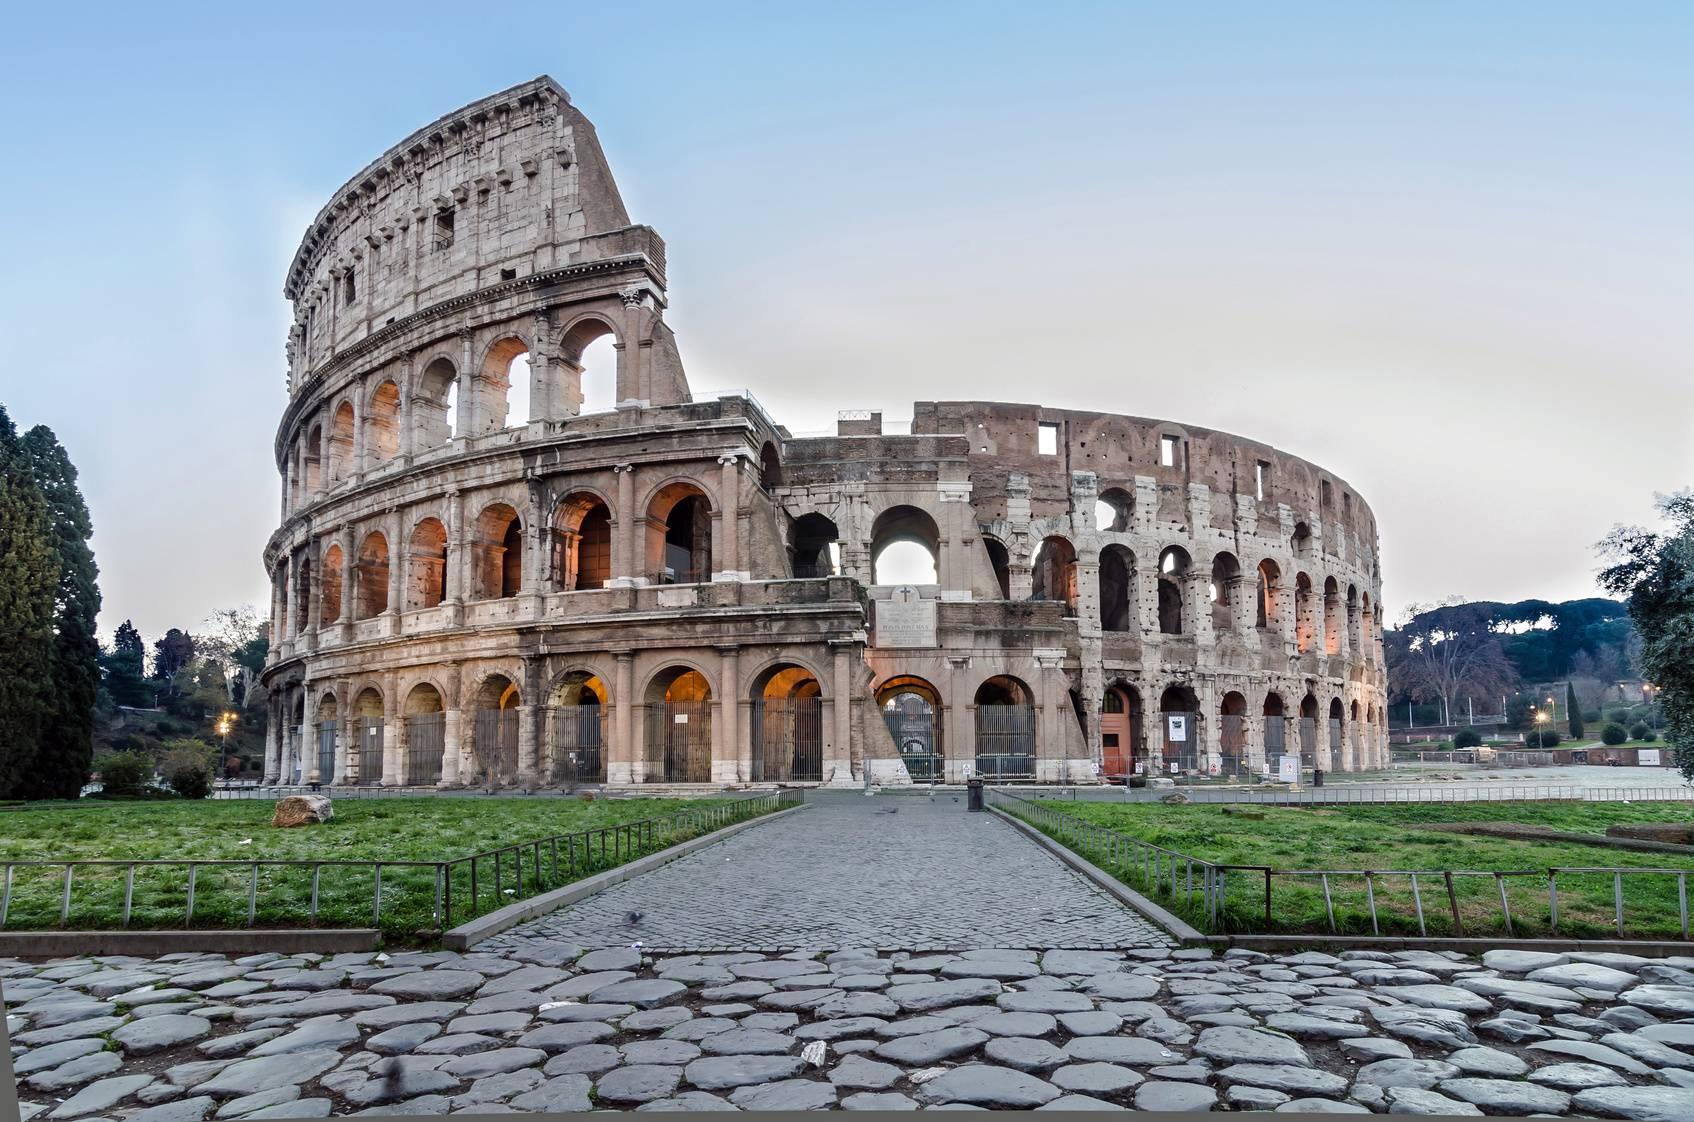 Italia img - 1